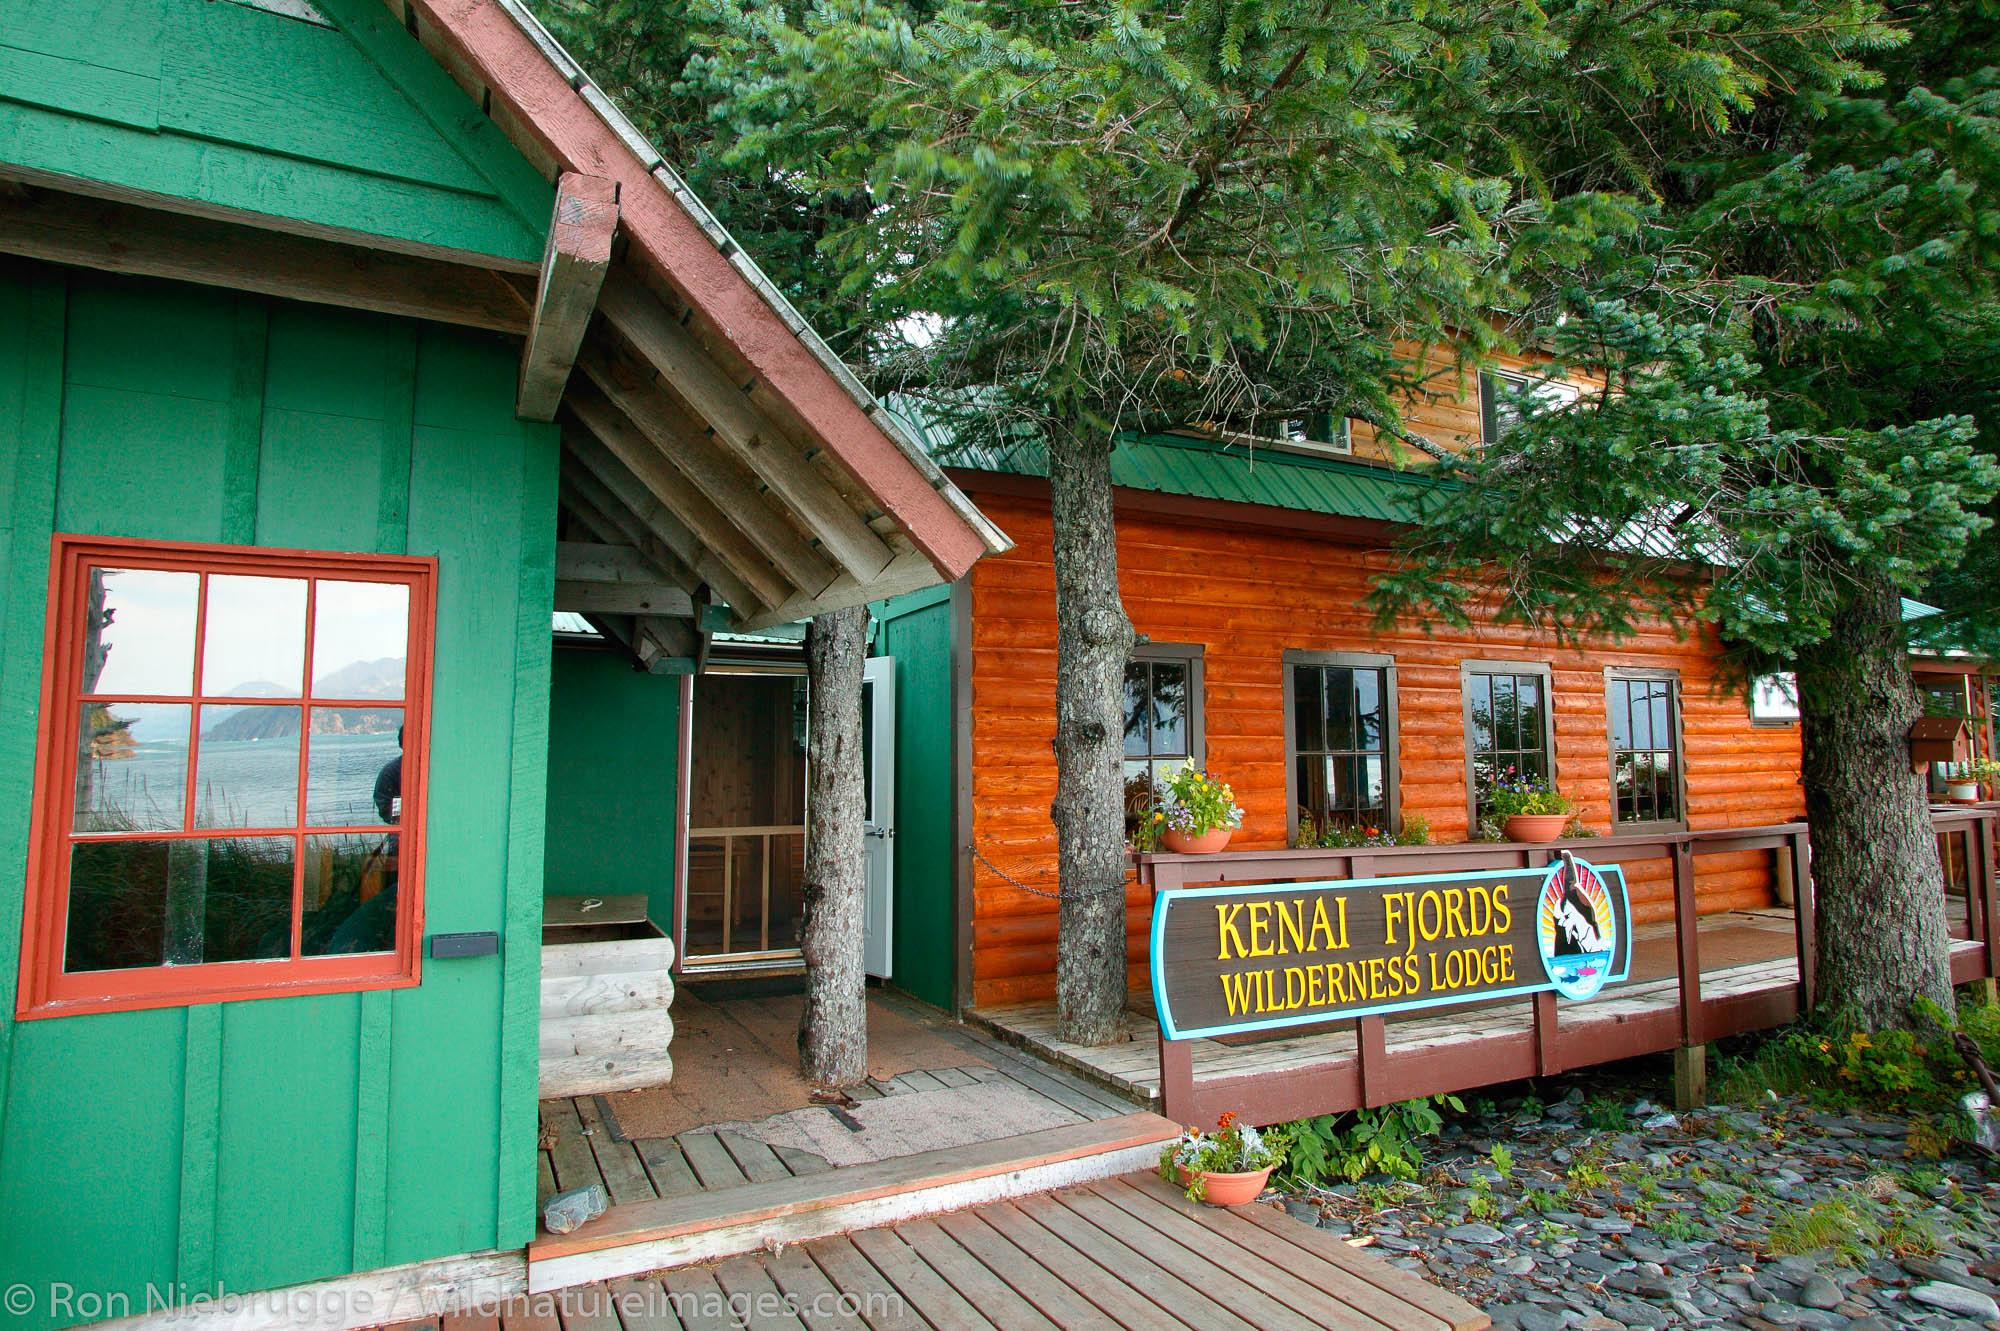 Kenai Fjords Wilderness Lodge Fox Island Alaska.